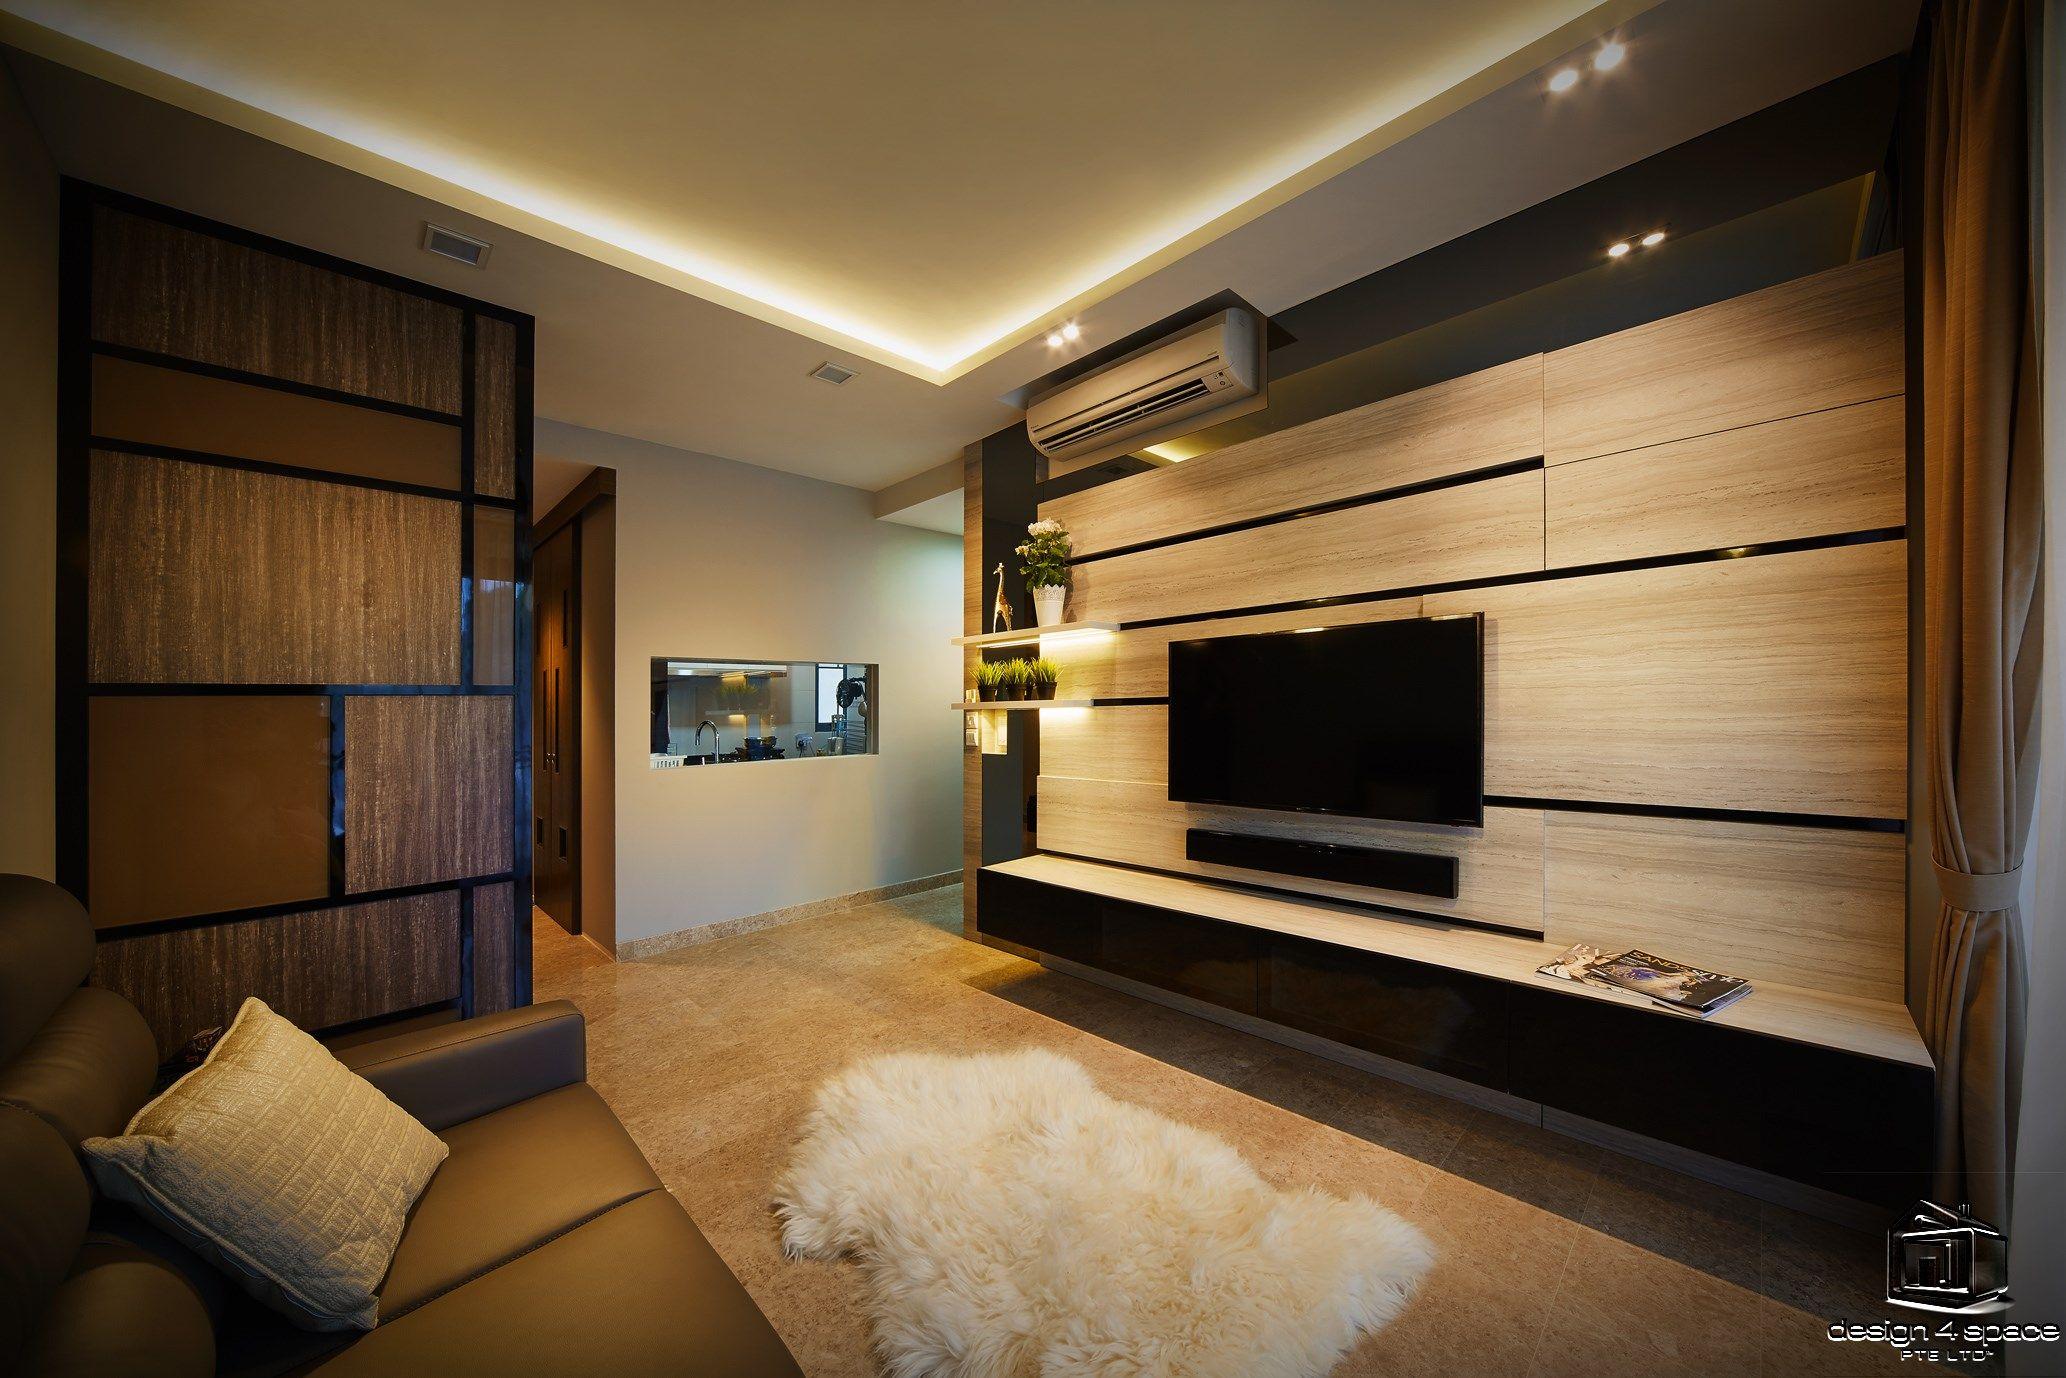 DESIGN4SPACE is home renovation & HDB interior design